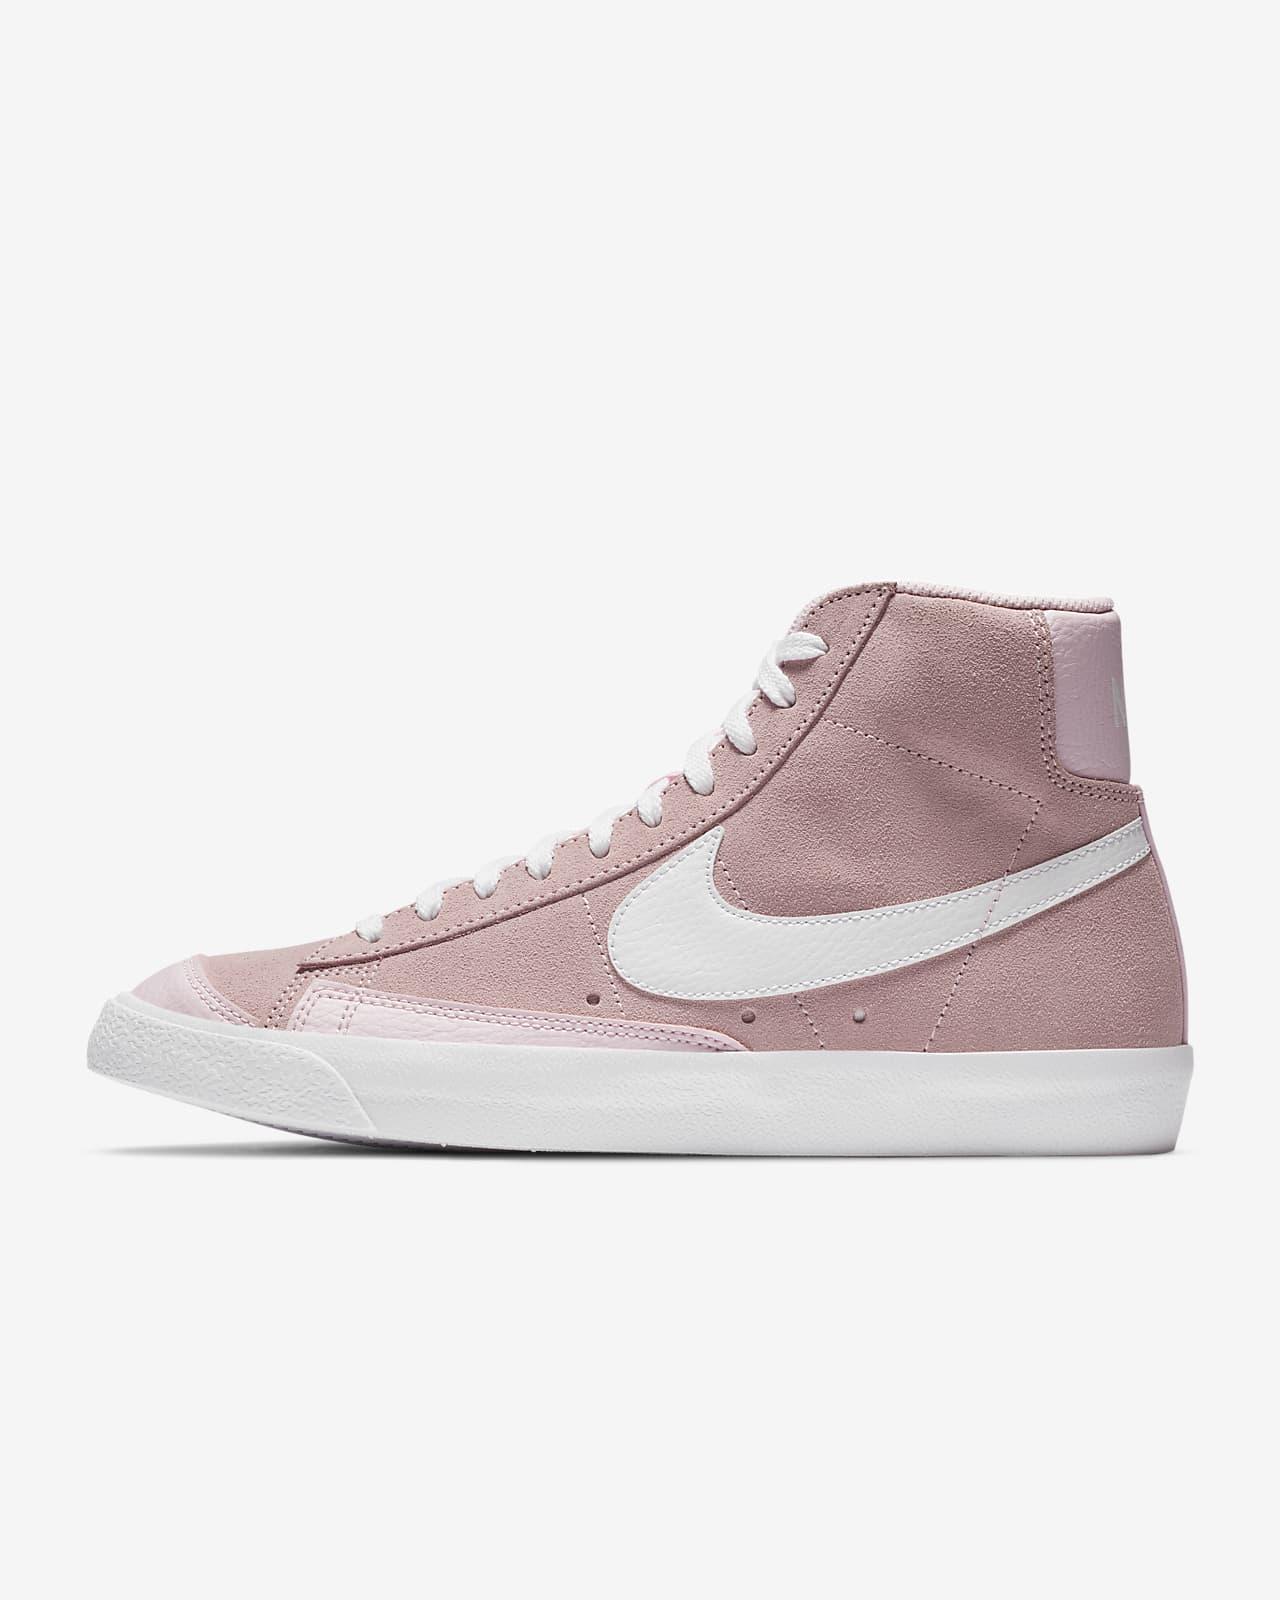 Antagonismo Hay una tendencia Deambular  Nike Blazer Mid Vintage '77 Women's Shoe. Nike IE